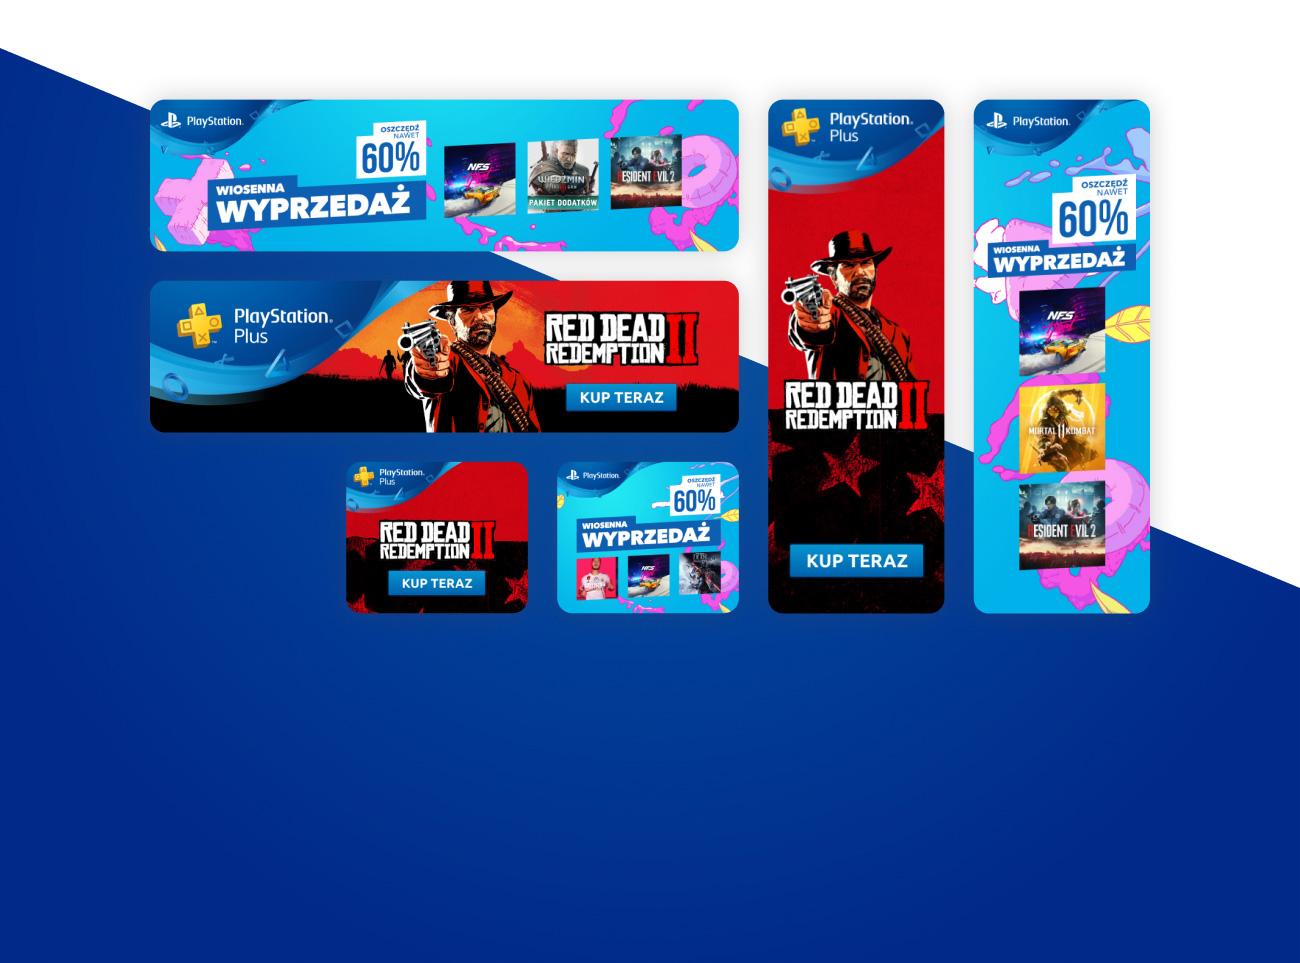 Projekty Bannerów reklamowych dla PlayStation z gier Red Dead Redemption II, Wiedźmin 3, NFS Heat